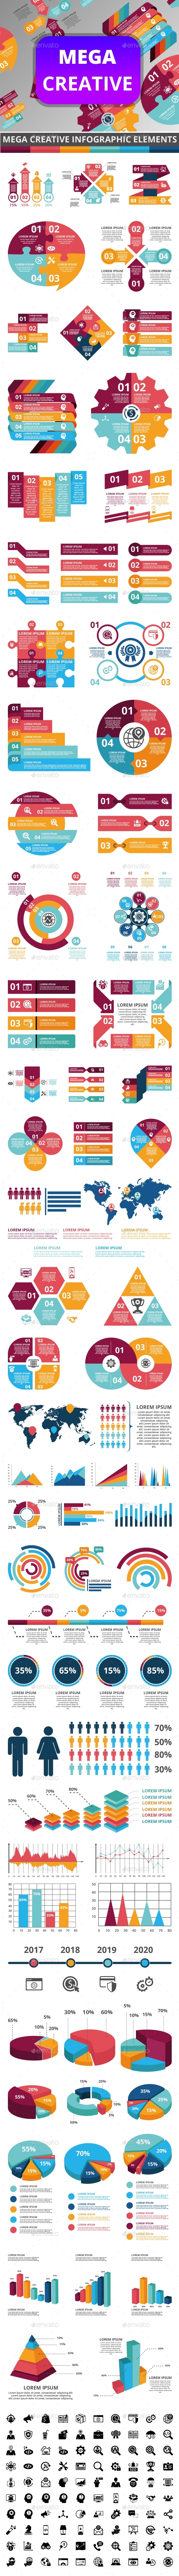 Mega Creative Infographic - Infographics